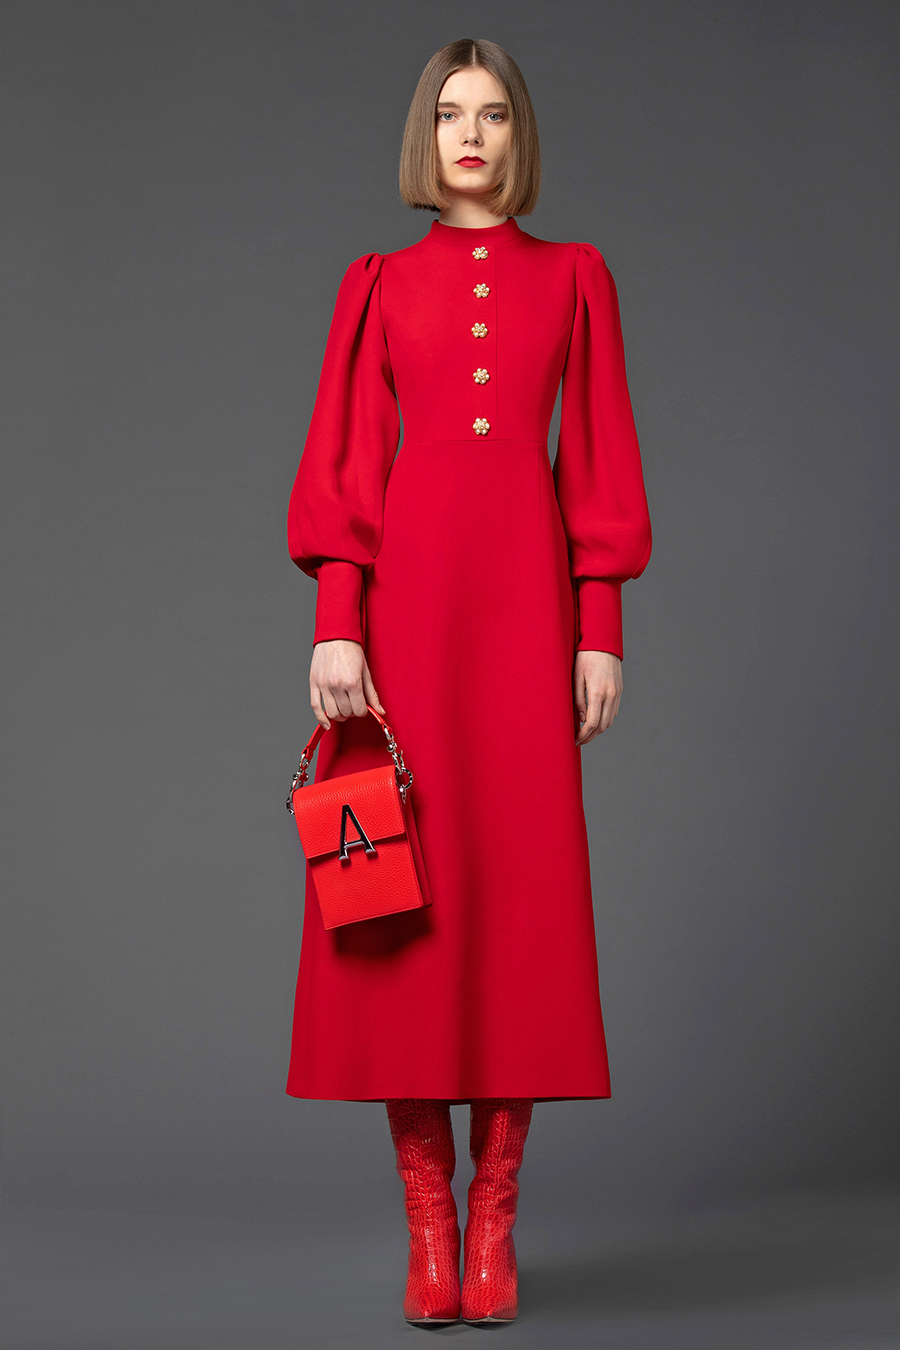 тренды осень зима 2021 2021 красный алый цветплатье сапоги сумка